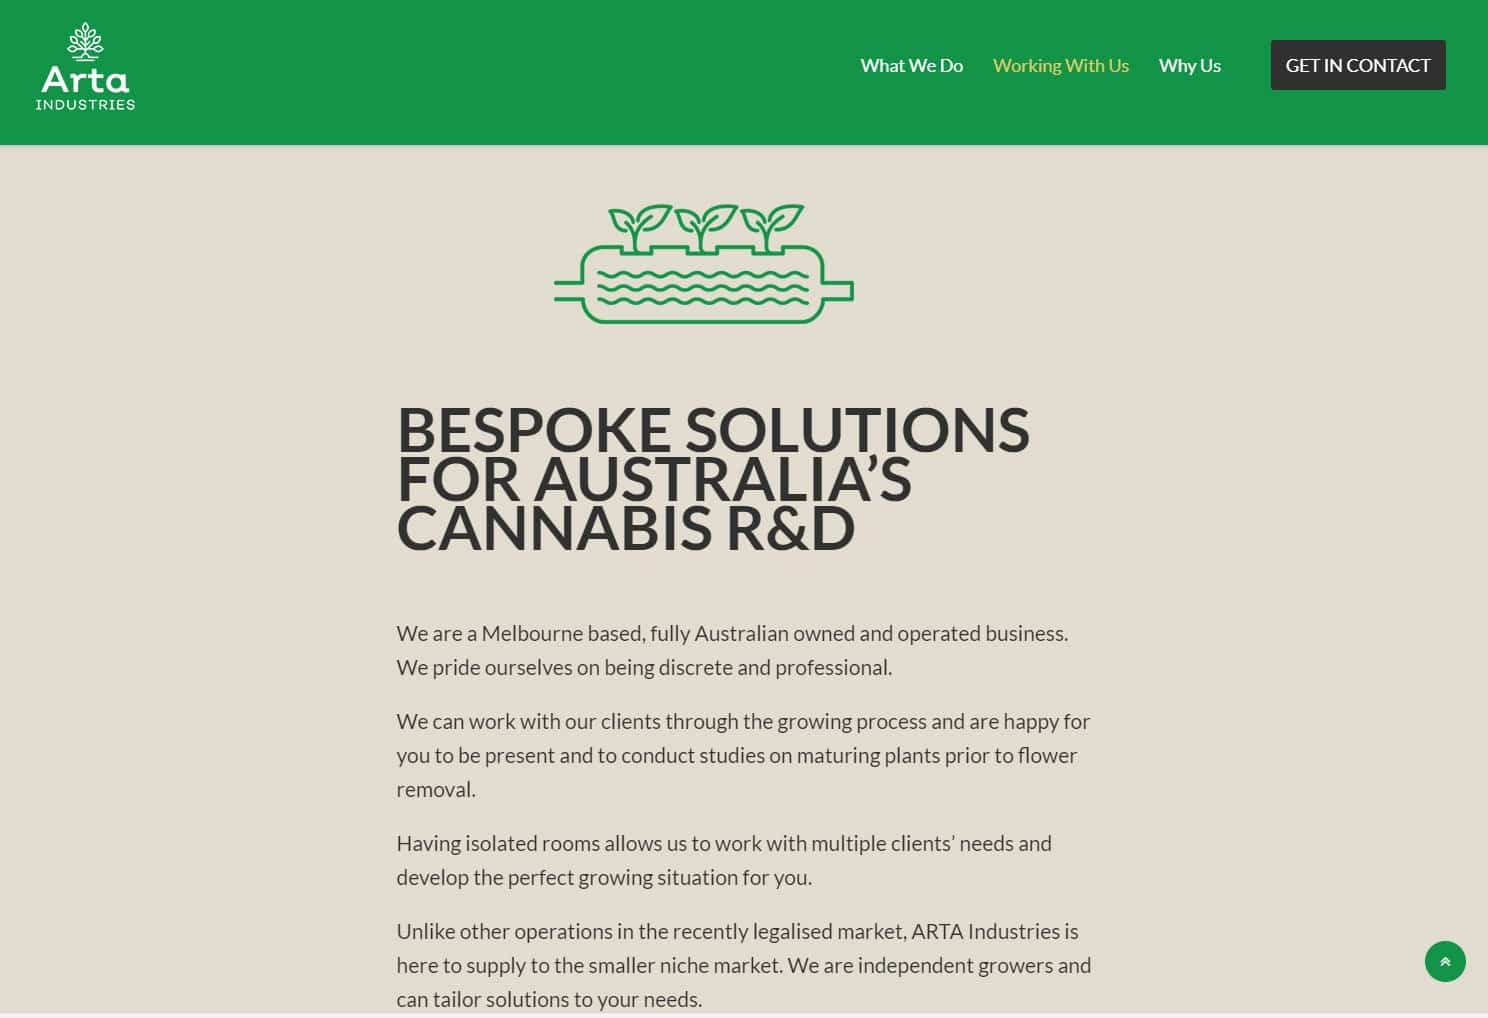 Arta Industries Website, Design And Wordpress Build By Birdhouse Digital